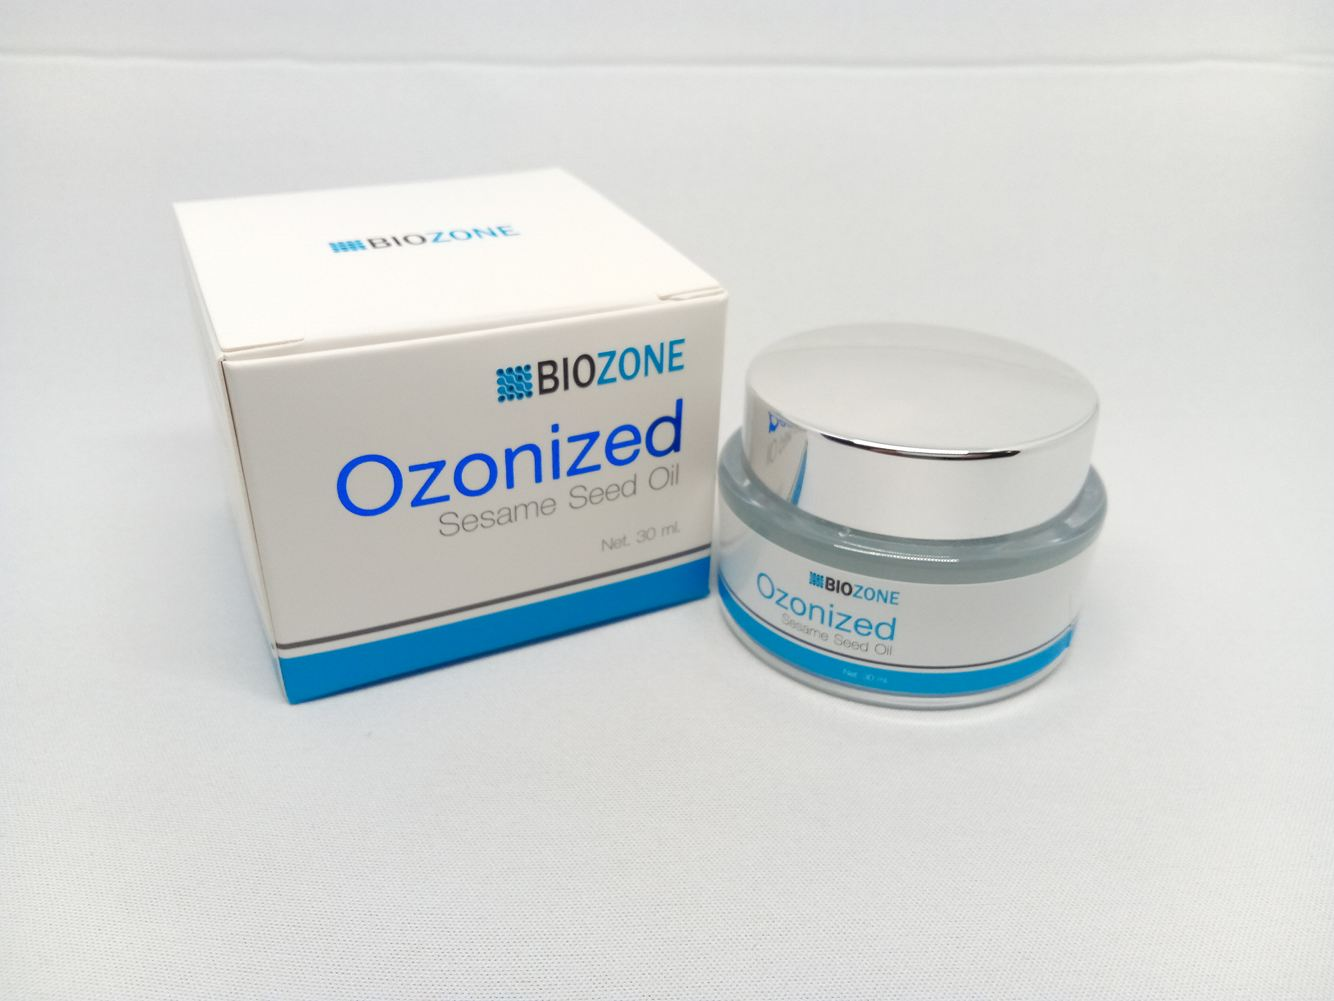 Ozonized Sesame Seed oil 100